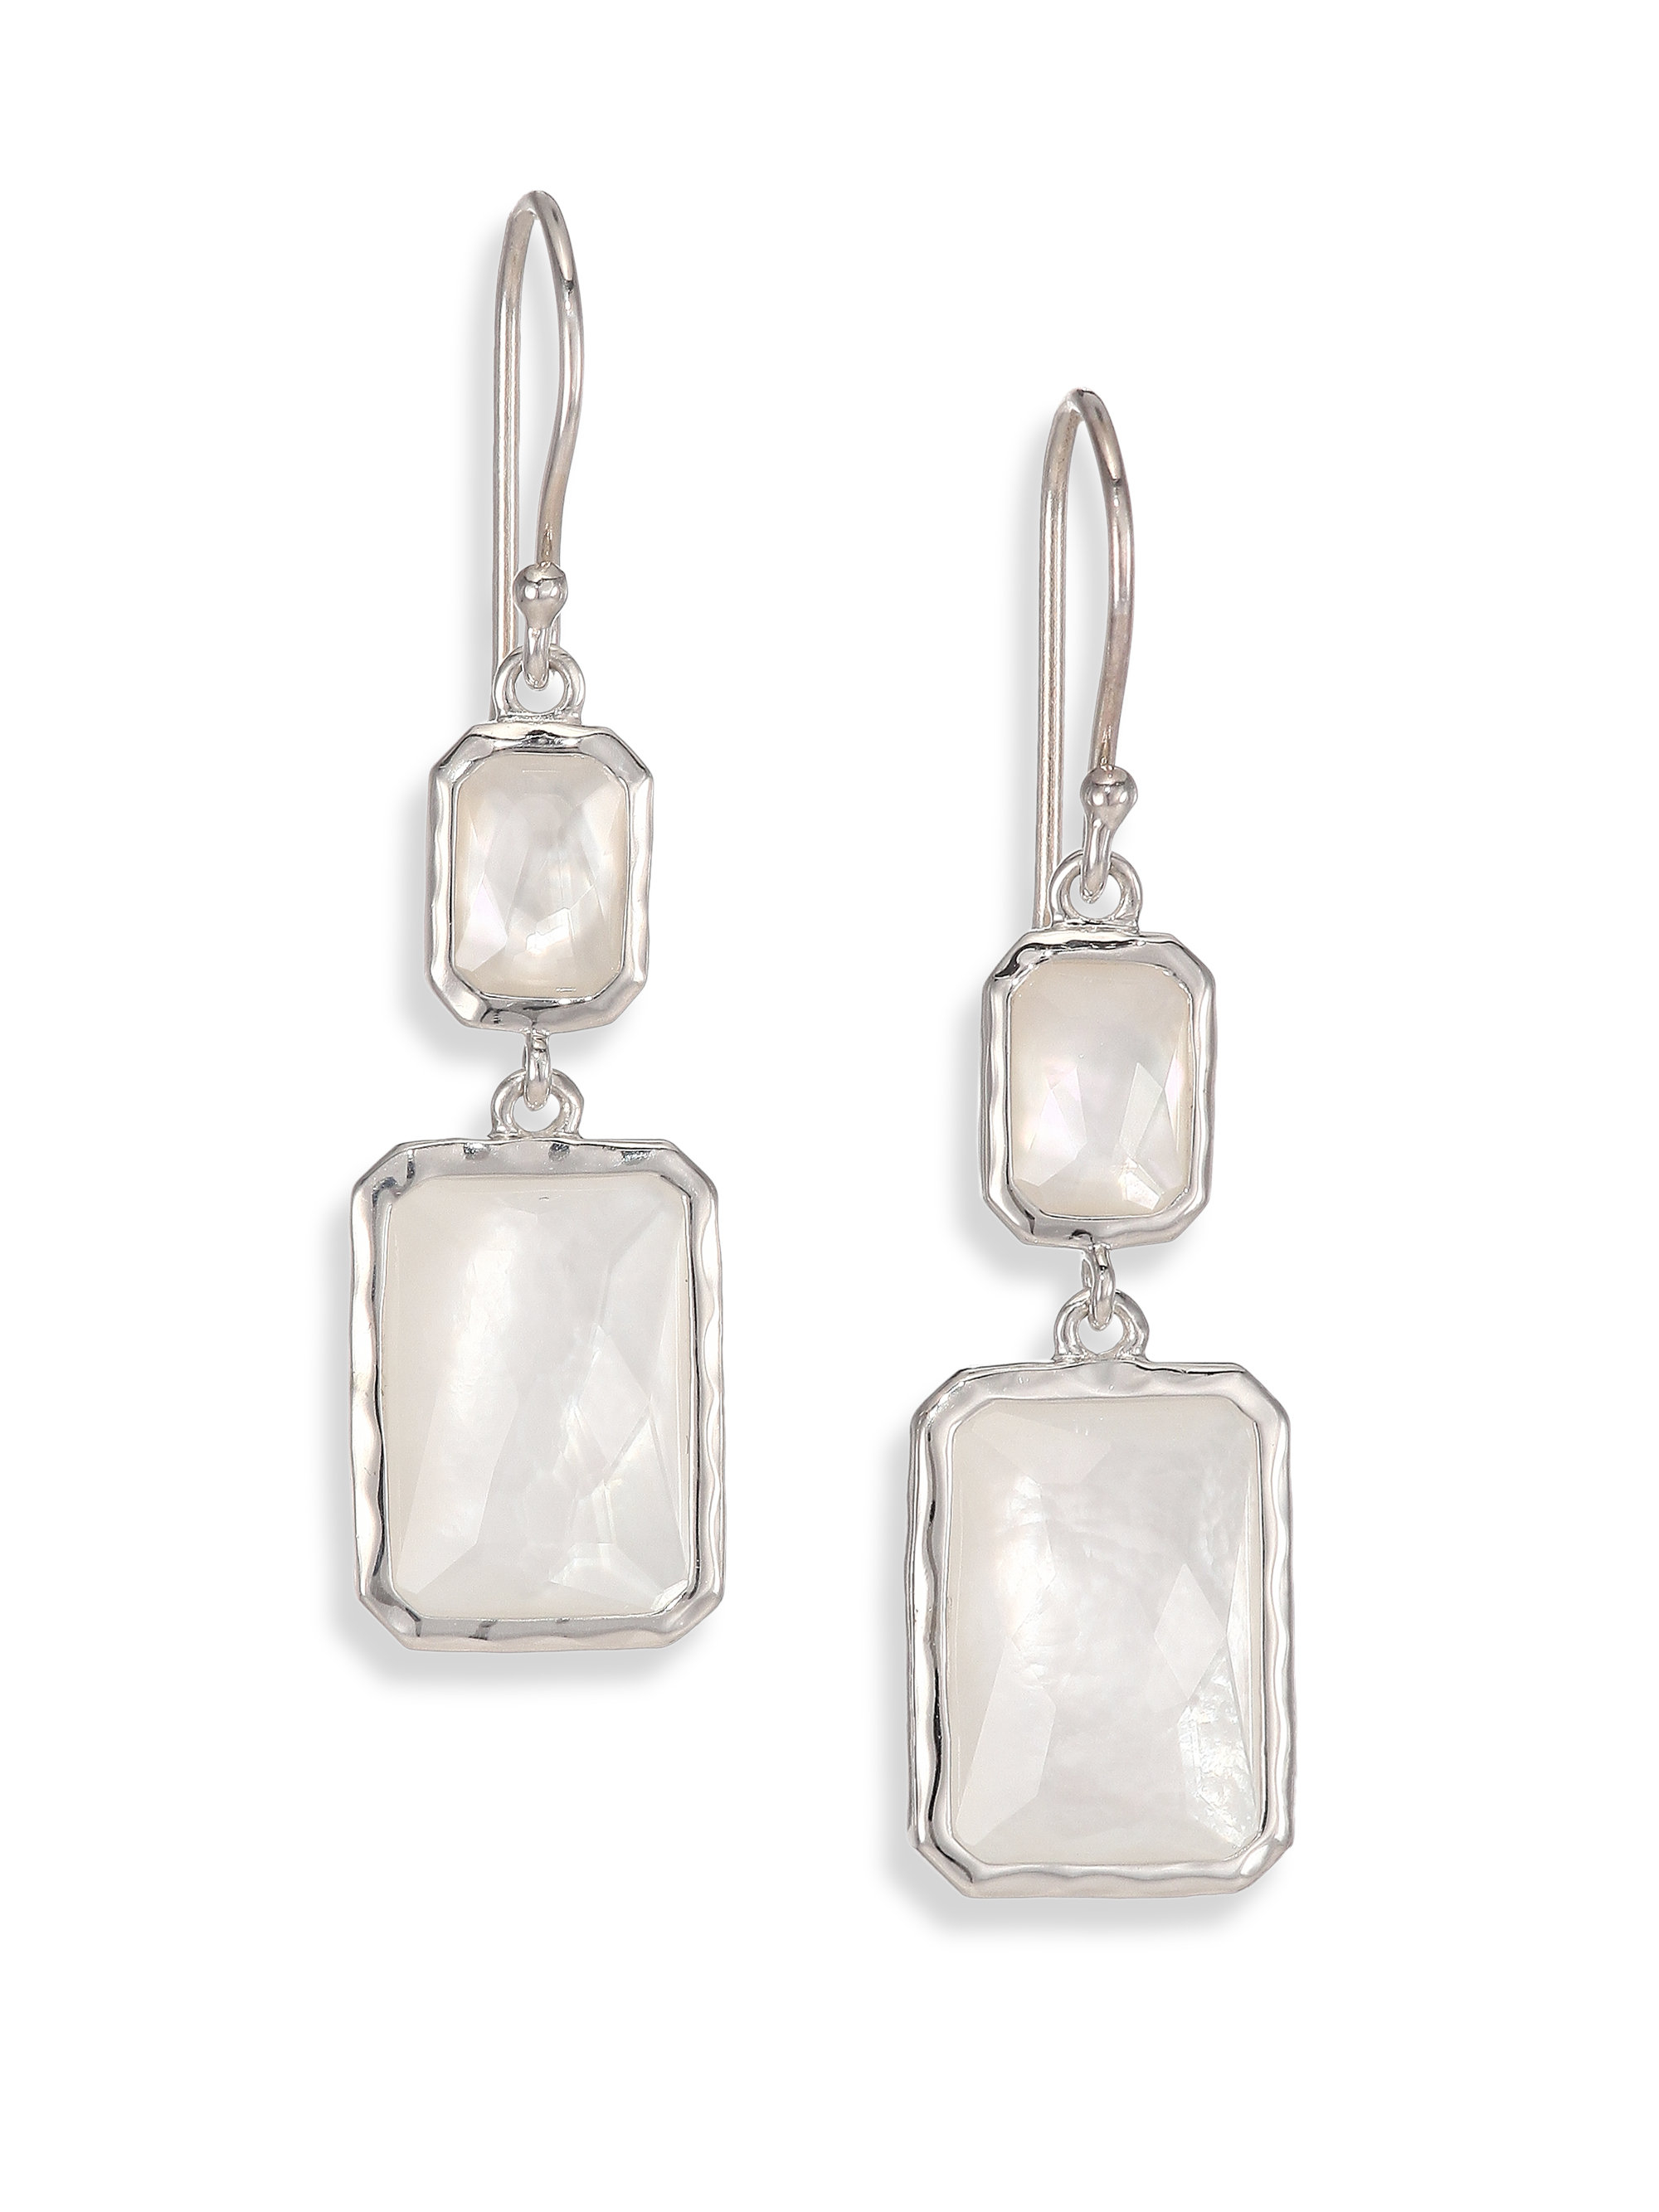 Ippolita 18K Rock Candy Black Mother-of-Pearl Snowman Earrings L0nWE